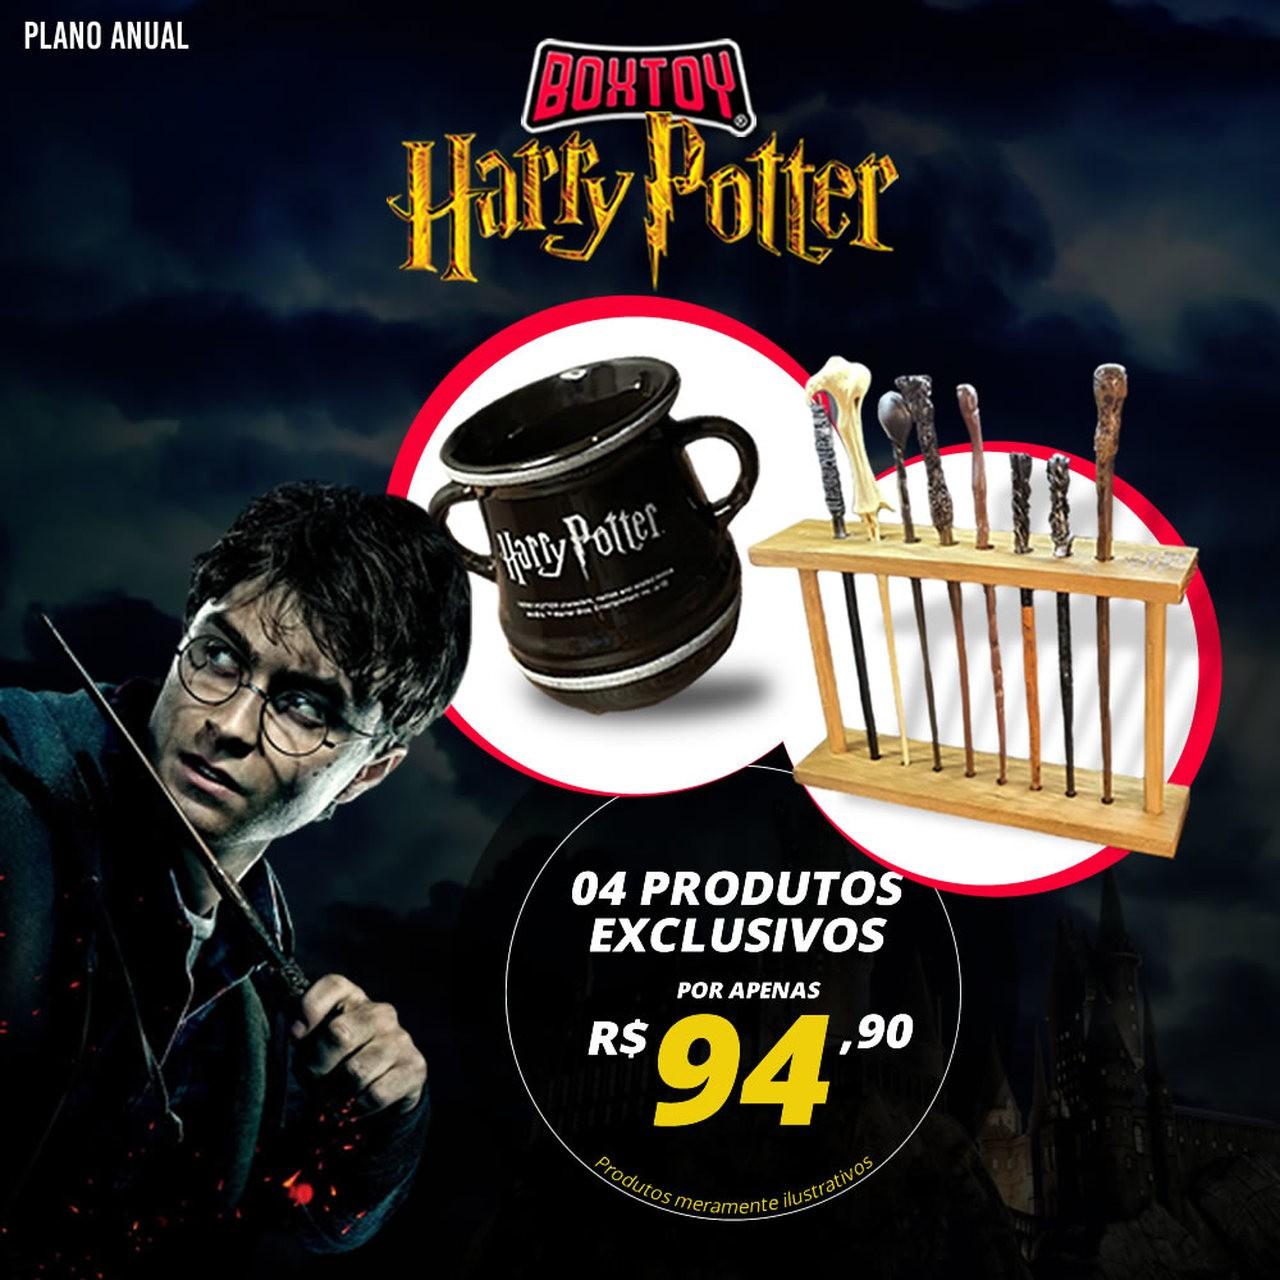 Boxtoy Edição Harry Potter ANUAL  - Boxtoy